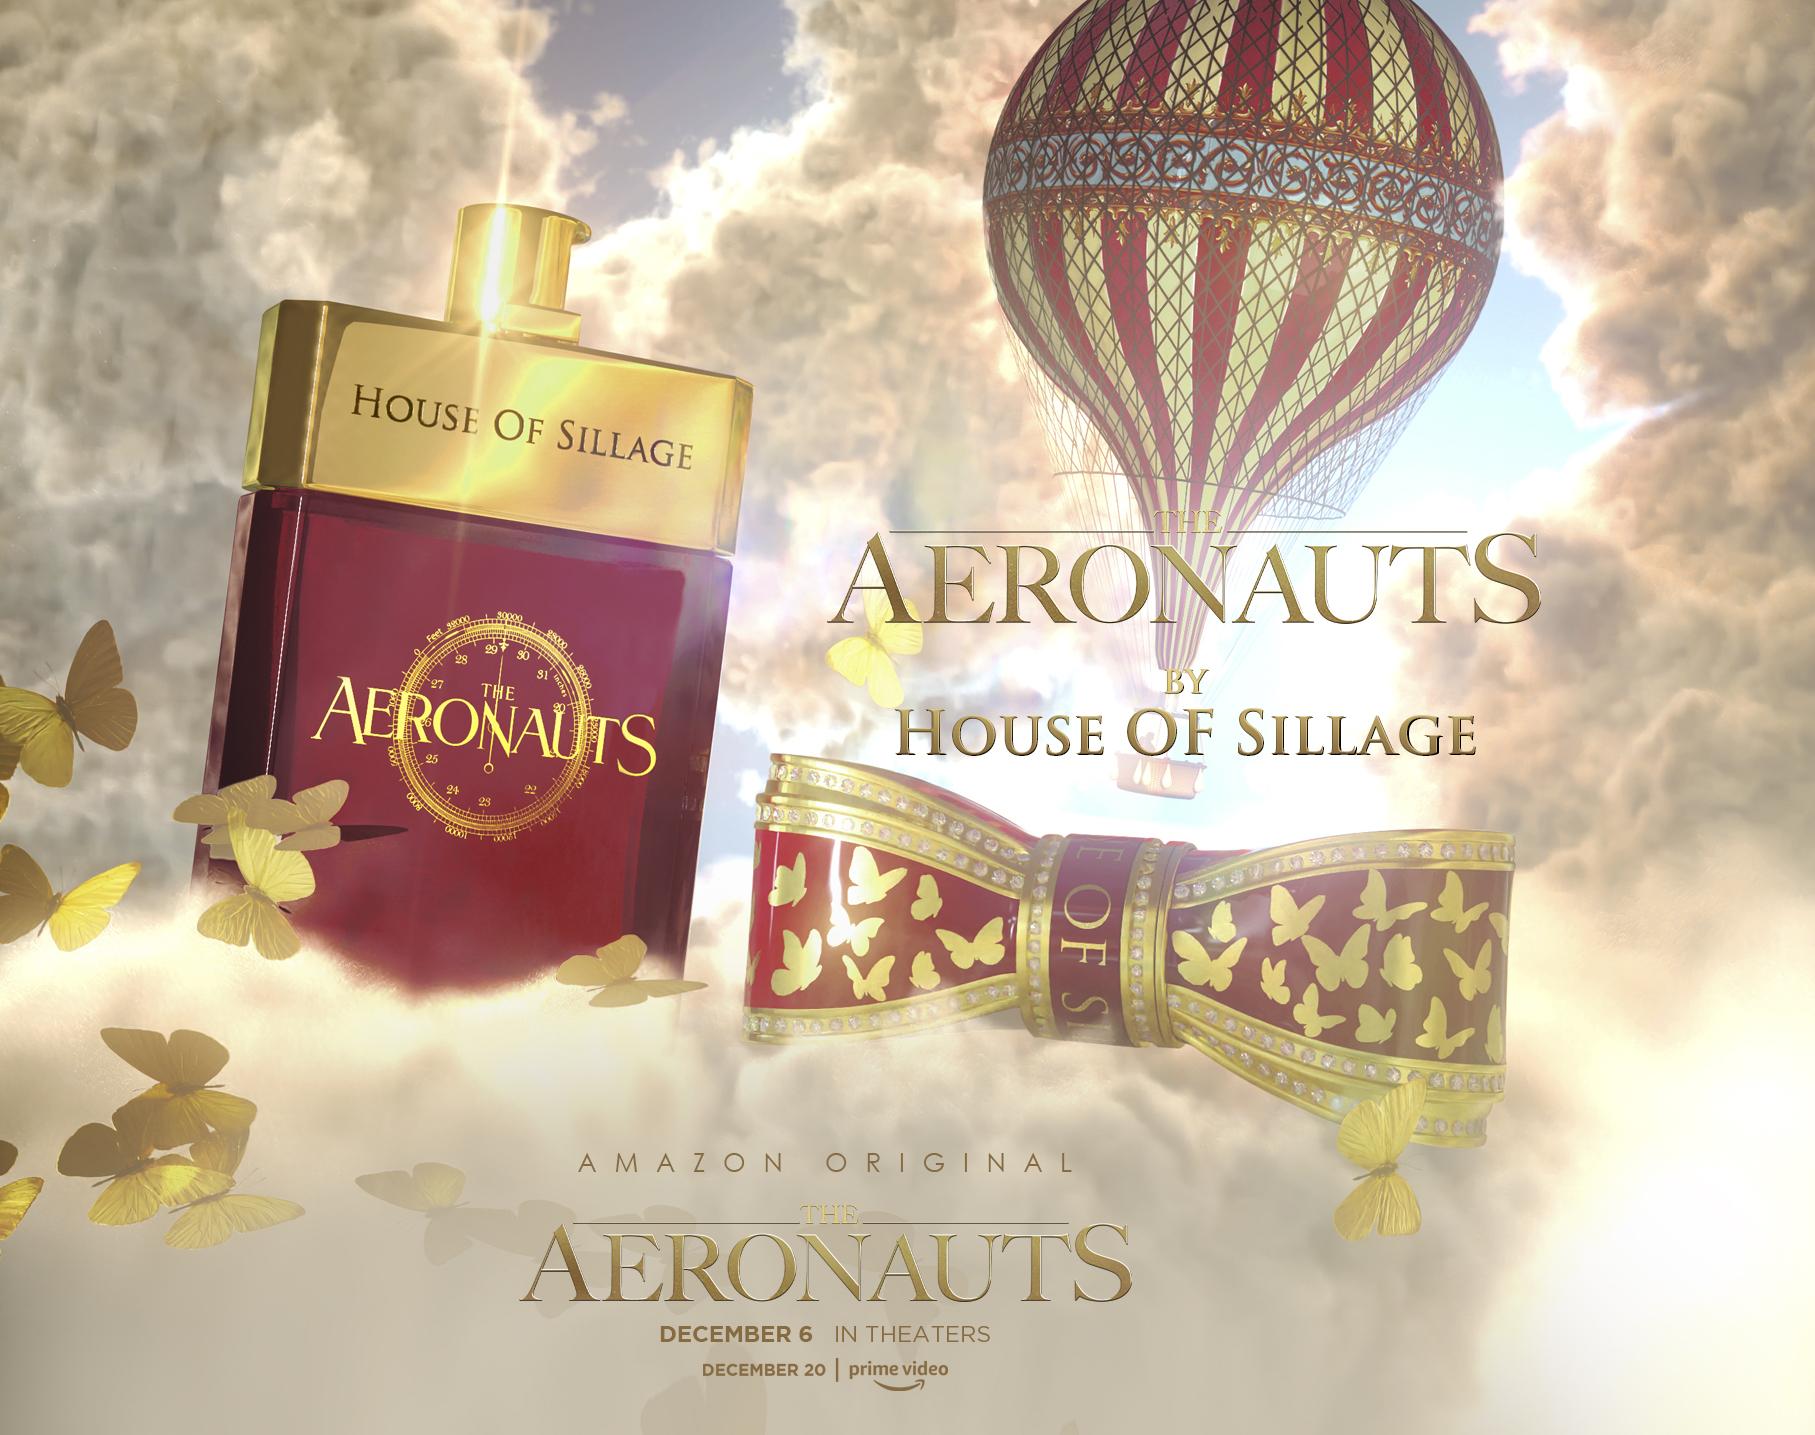 House of Sillage x The Aeronauts